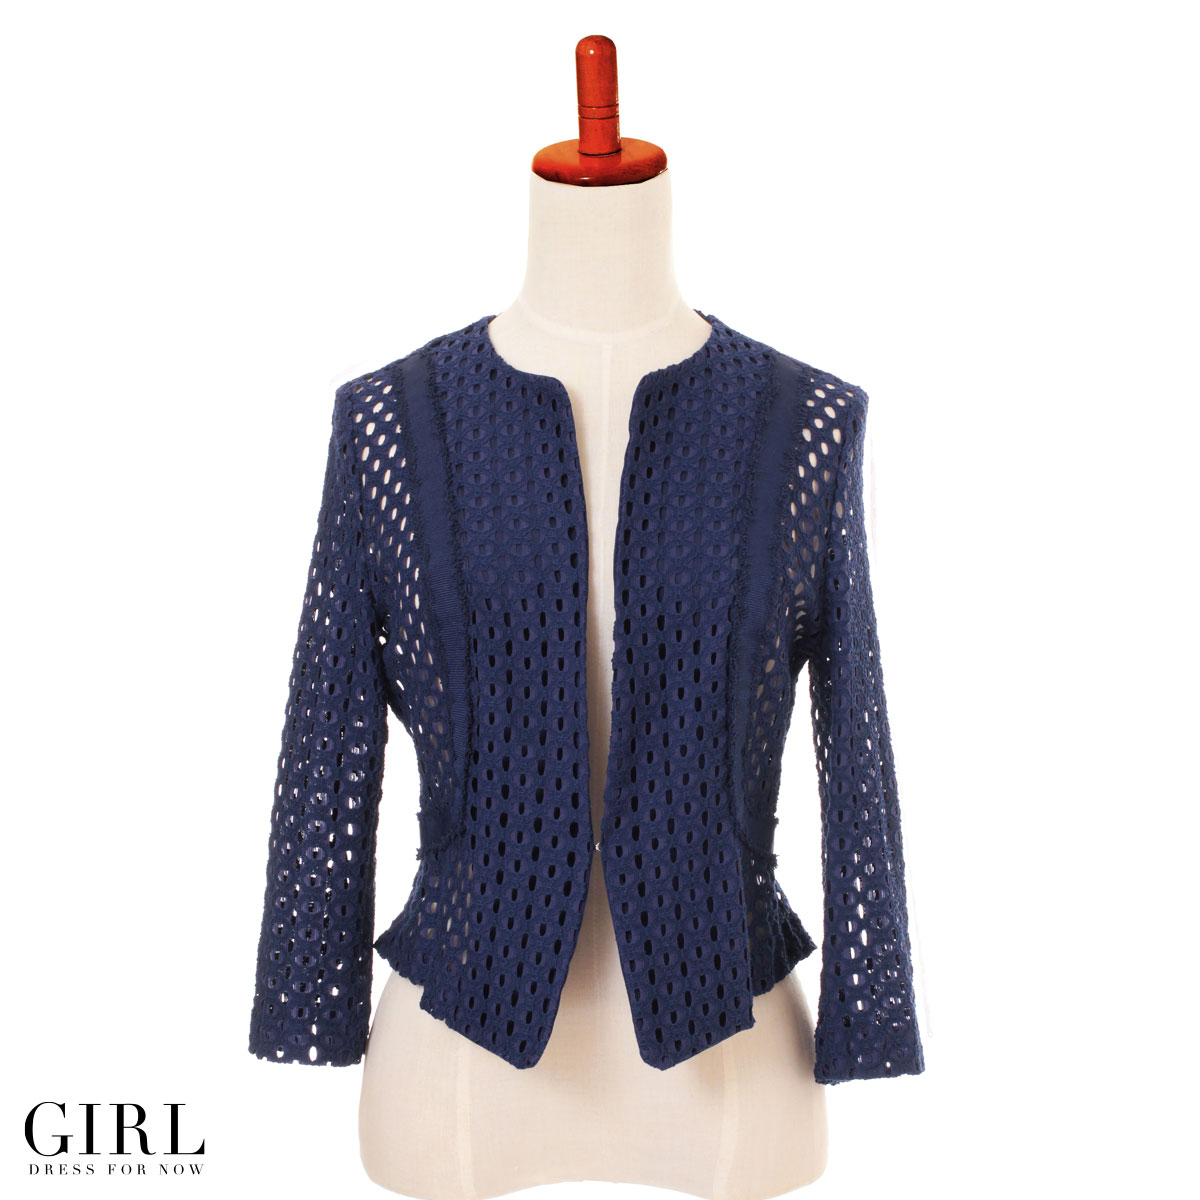 Dress shop GIRL | Rakuten Global Market: Bolero jacket wedding ...